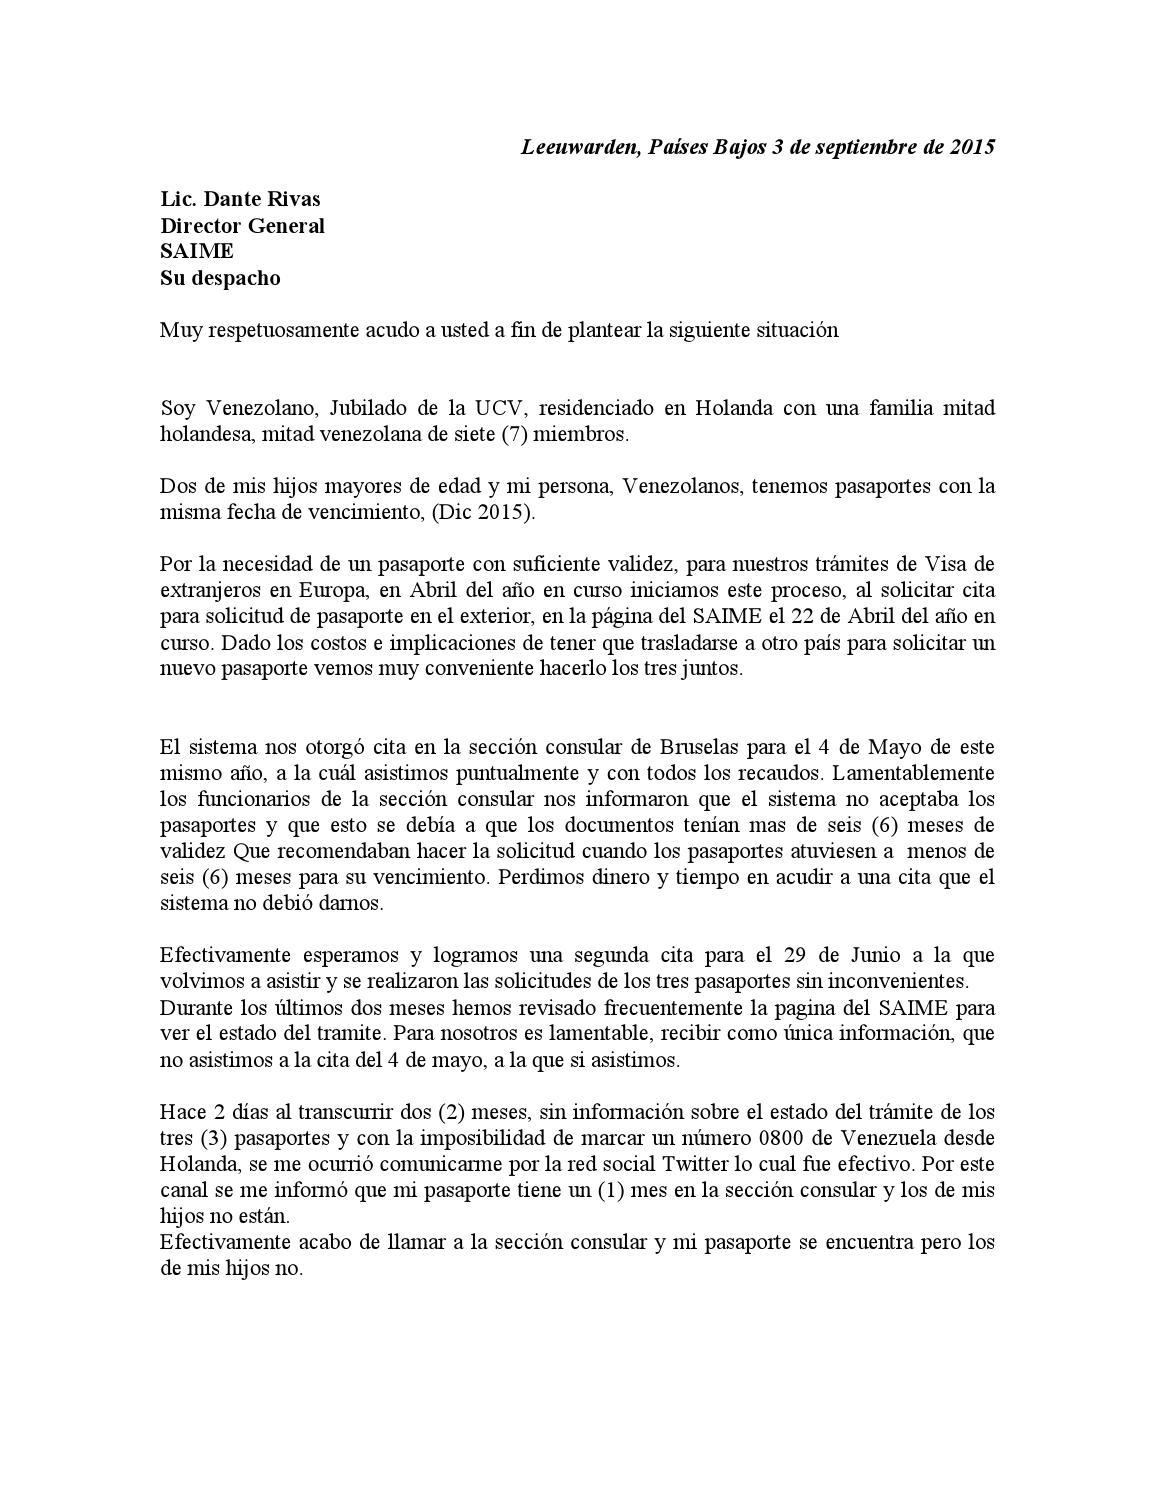 carta al director general del saime by jos u00e9 gil